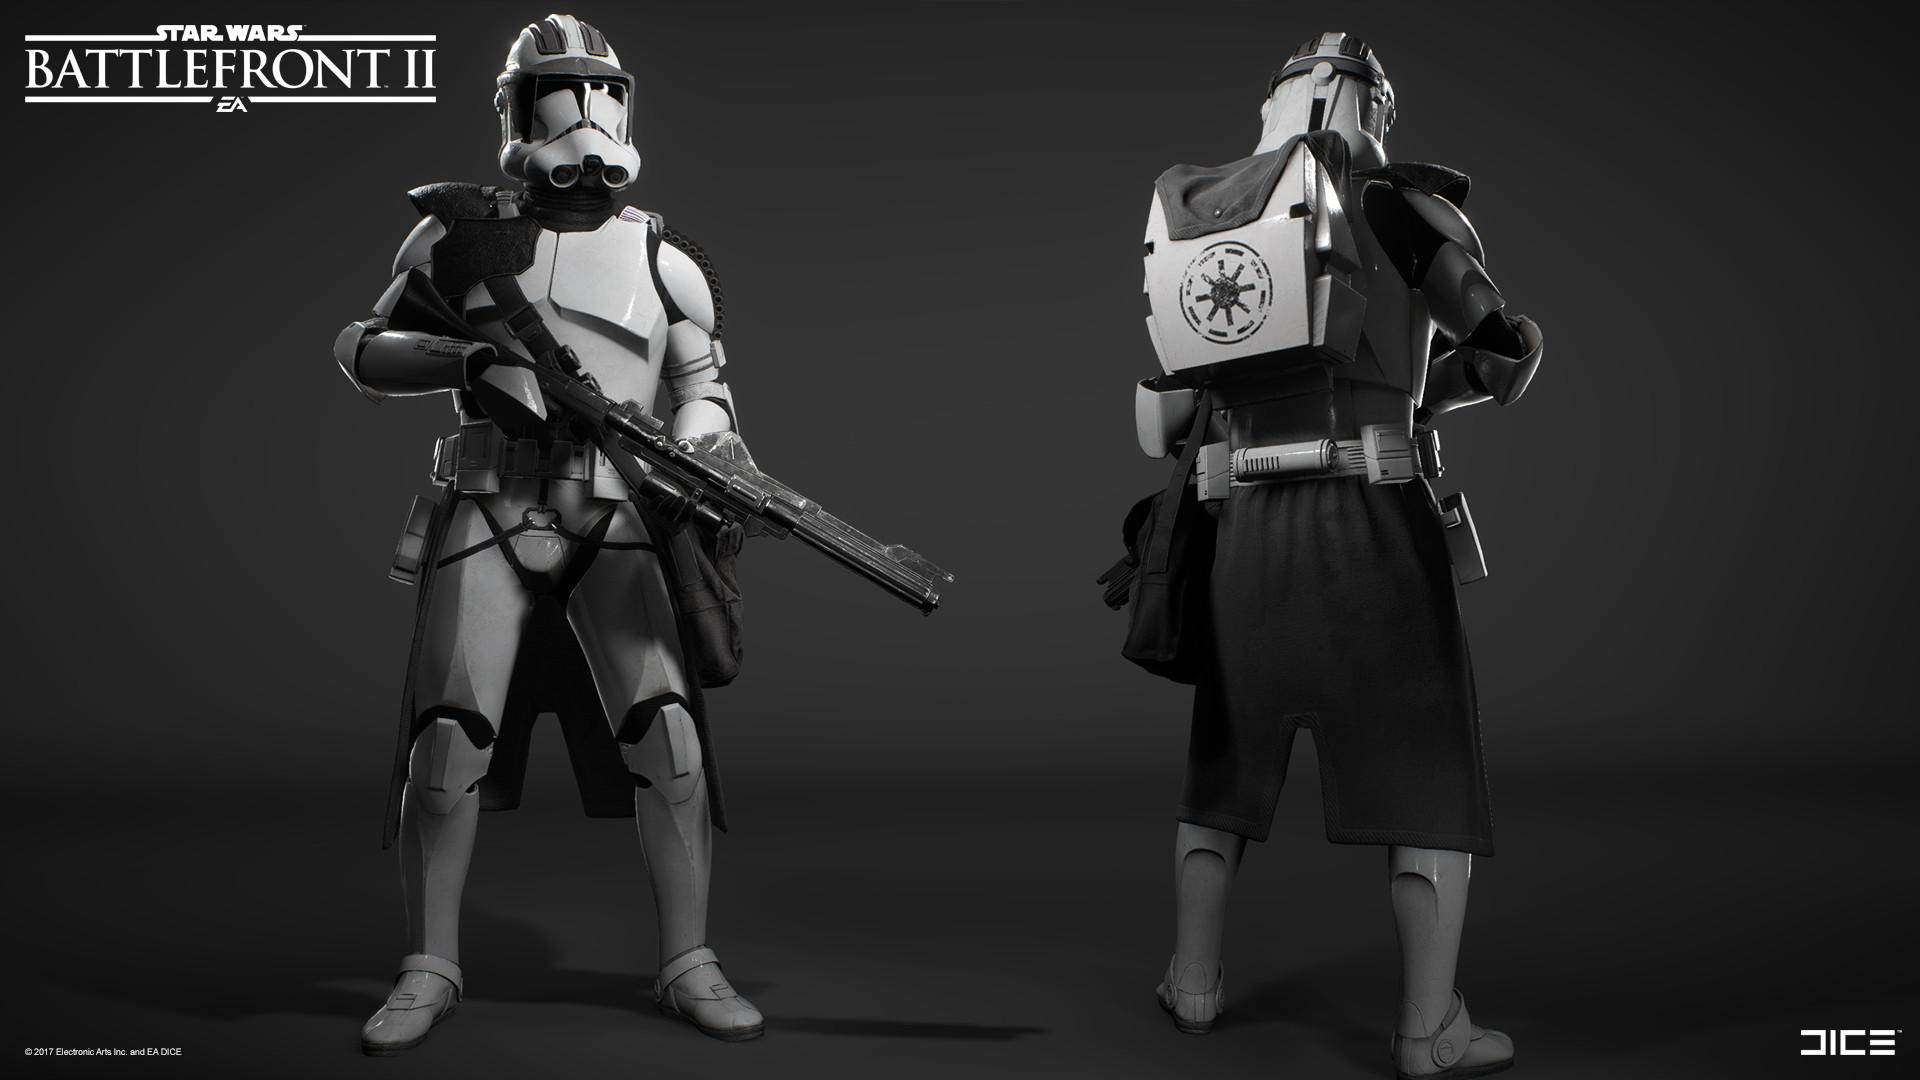 björn arvidsson star wars battlefront 2 clone trooper heavy class